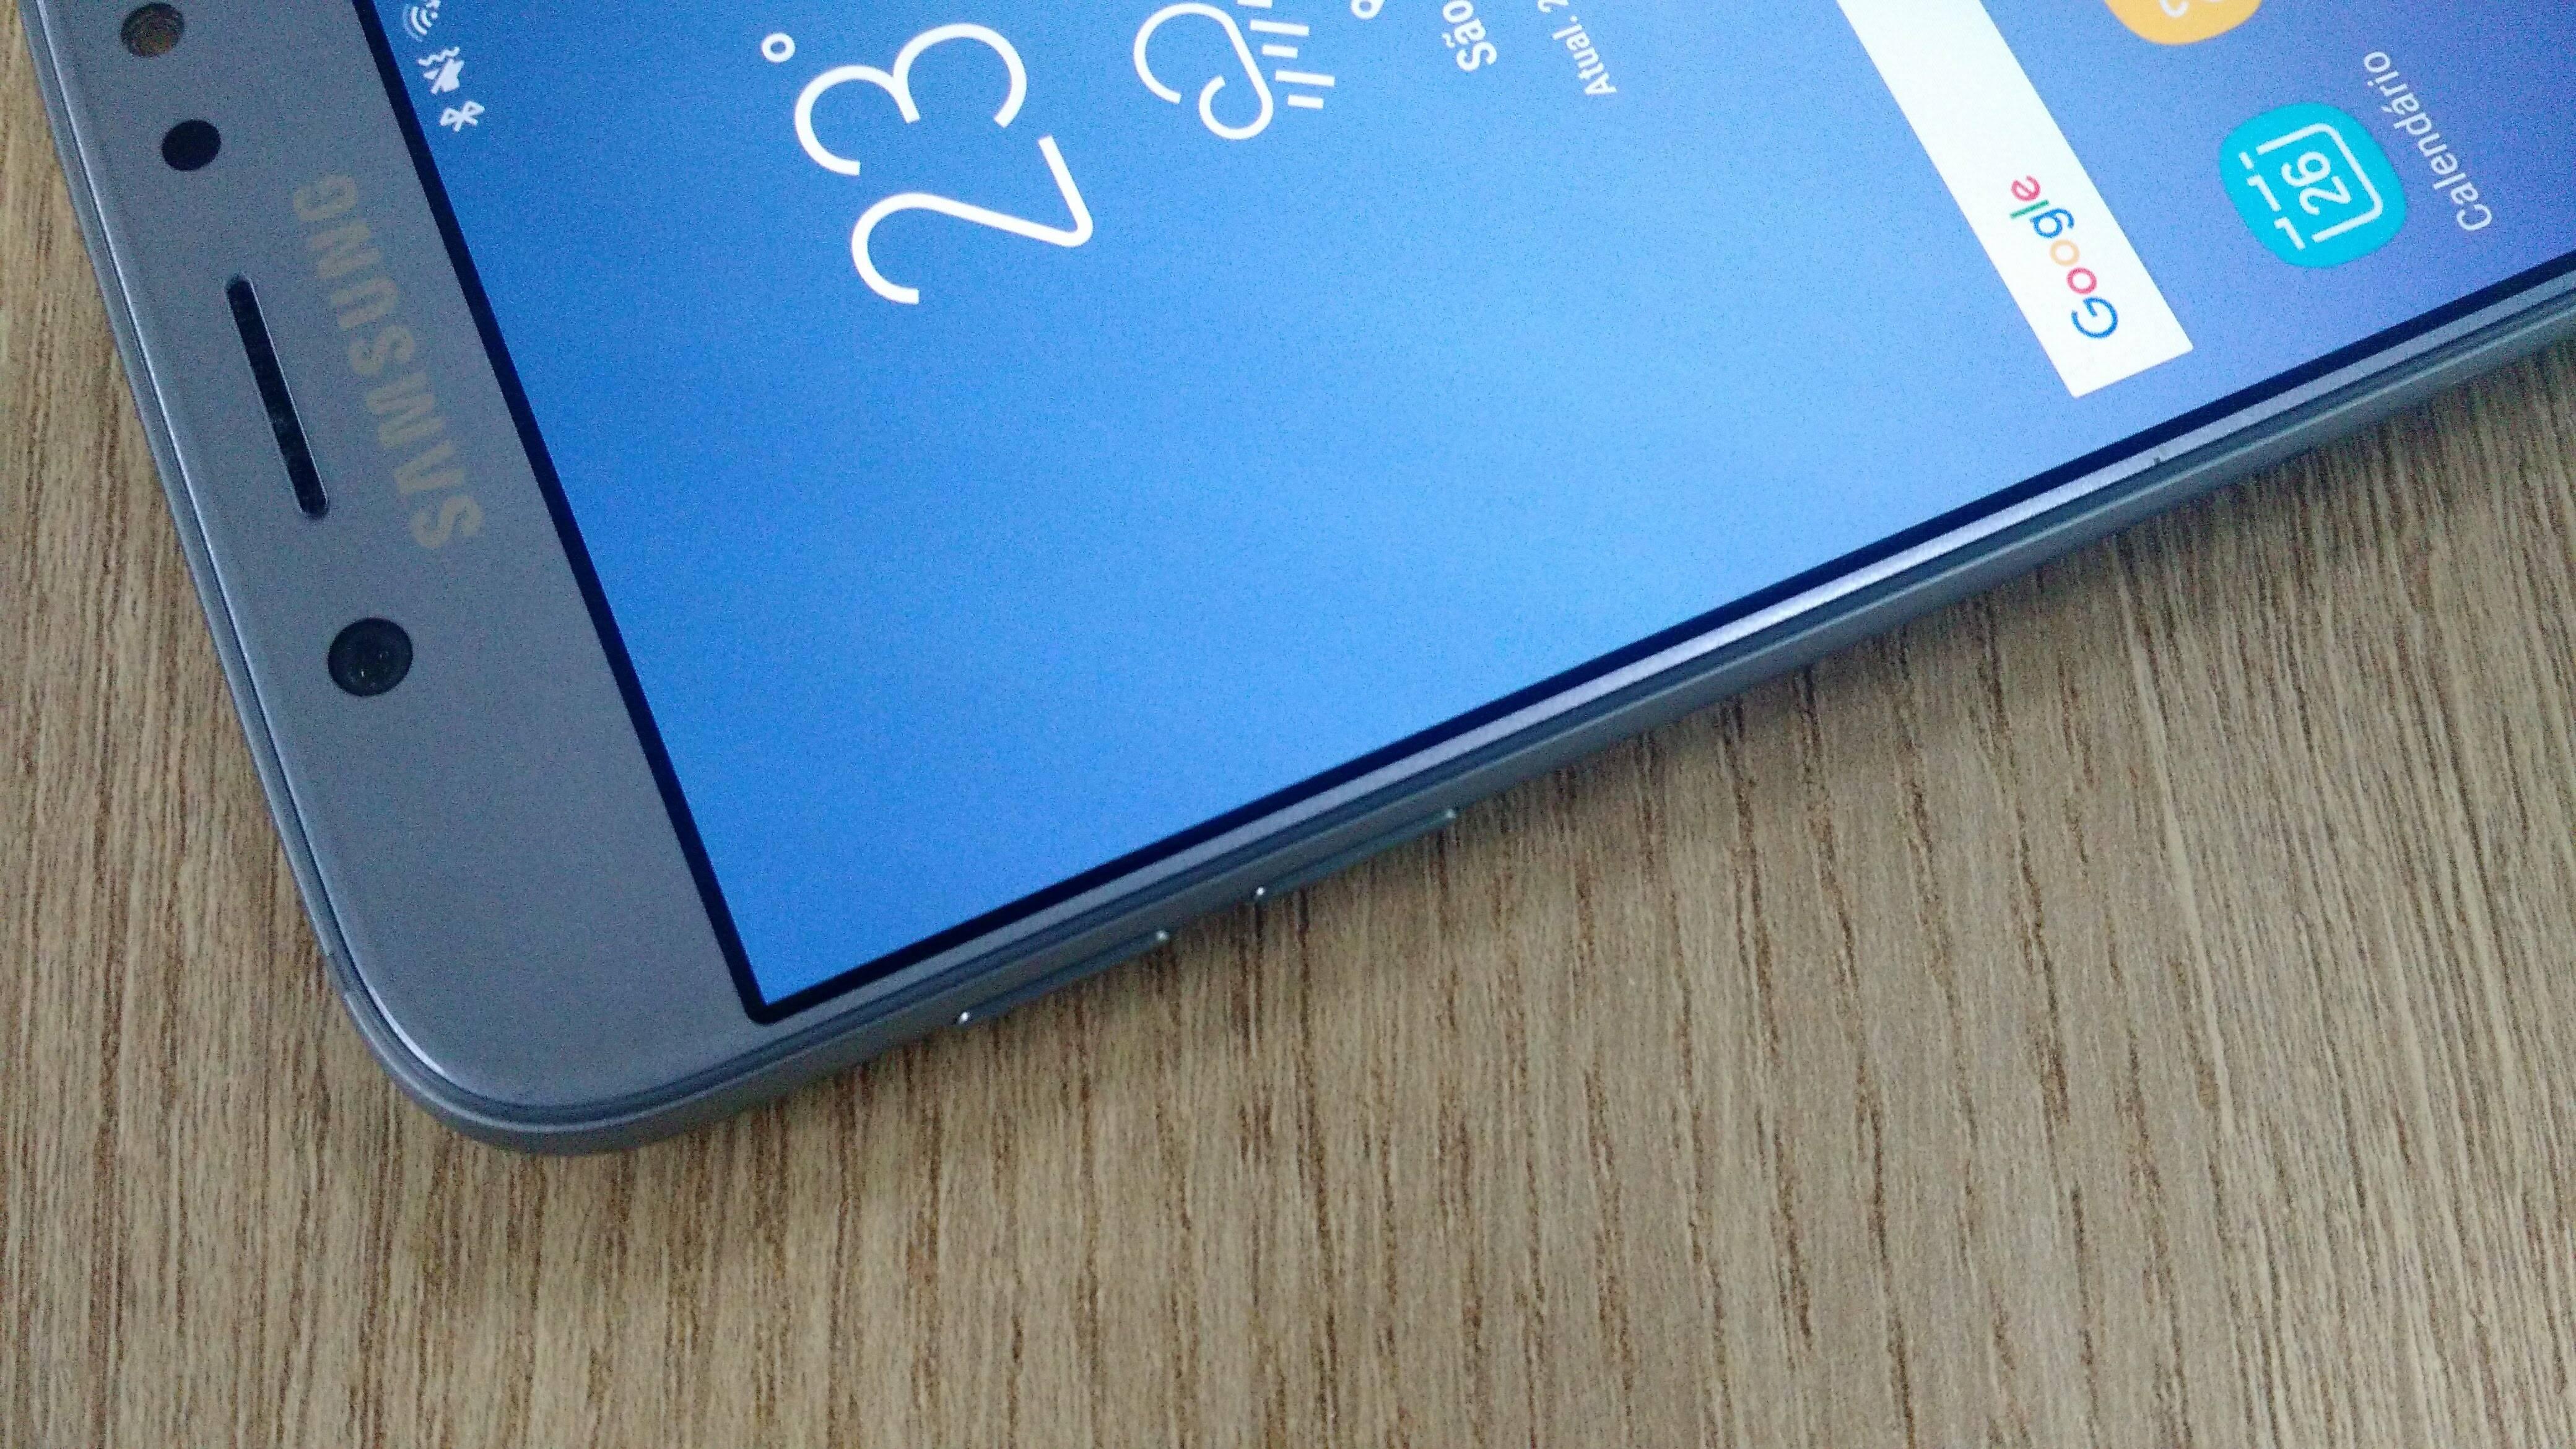 Galaxy J7 Pro conta com tela Full HD de 5,5 polegadas. Foto: Victor Hugo Silva/Brasil Econômico